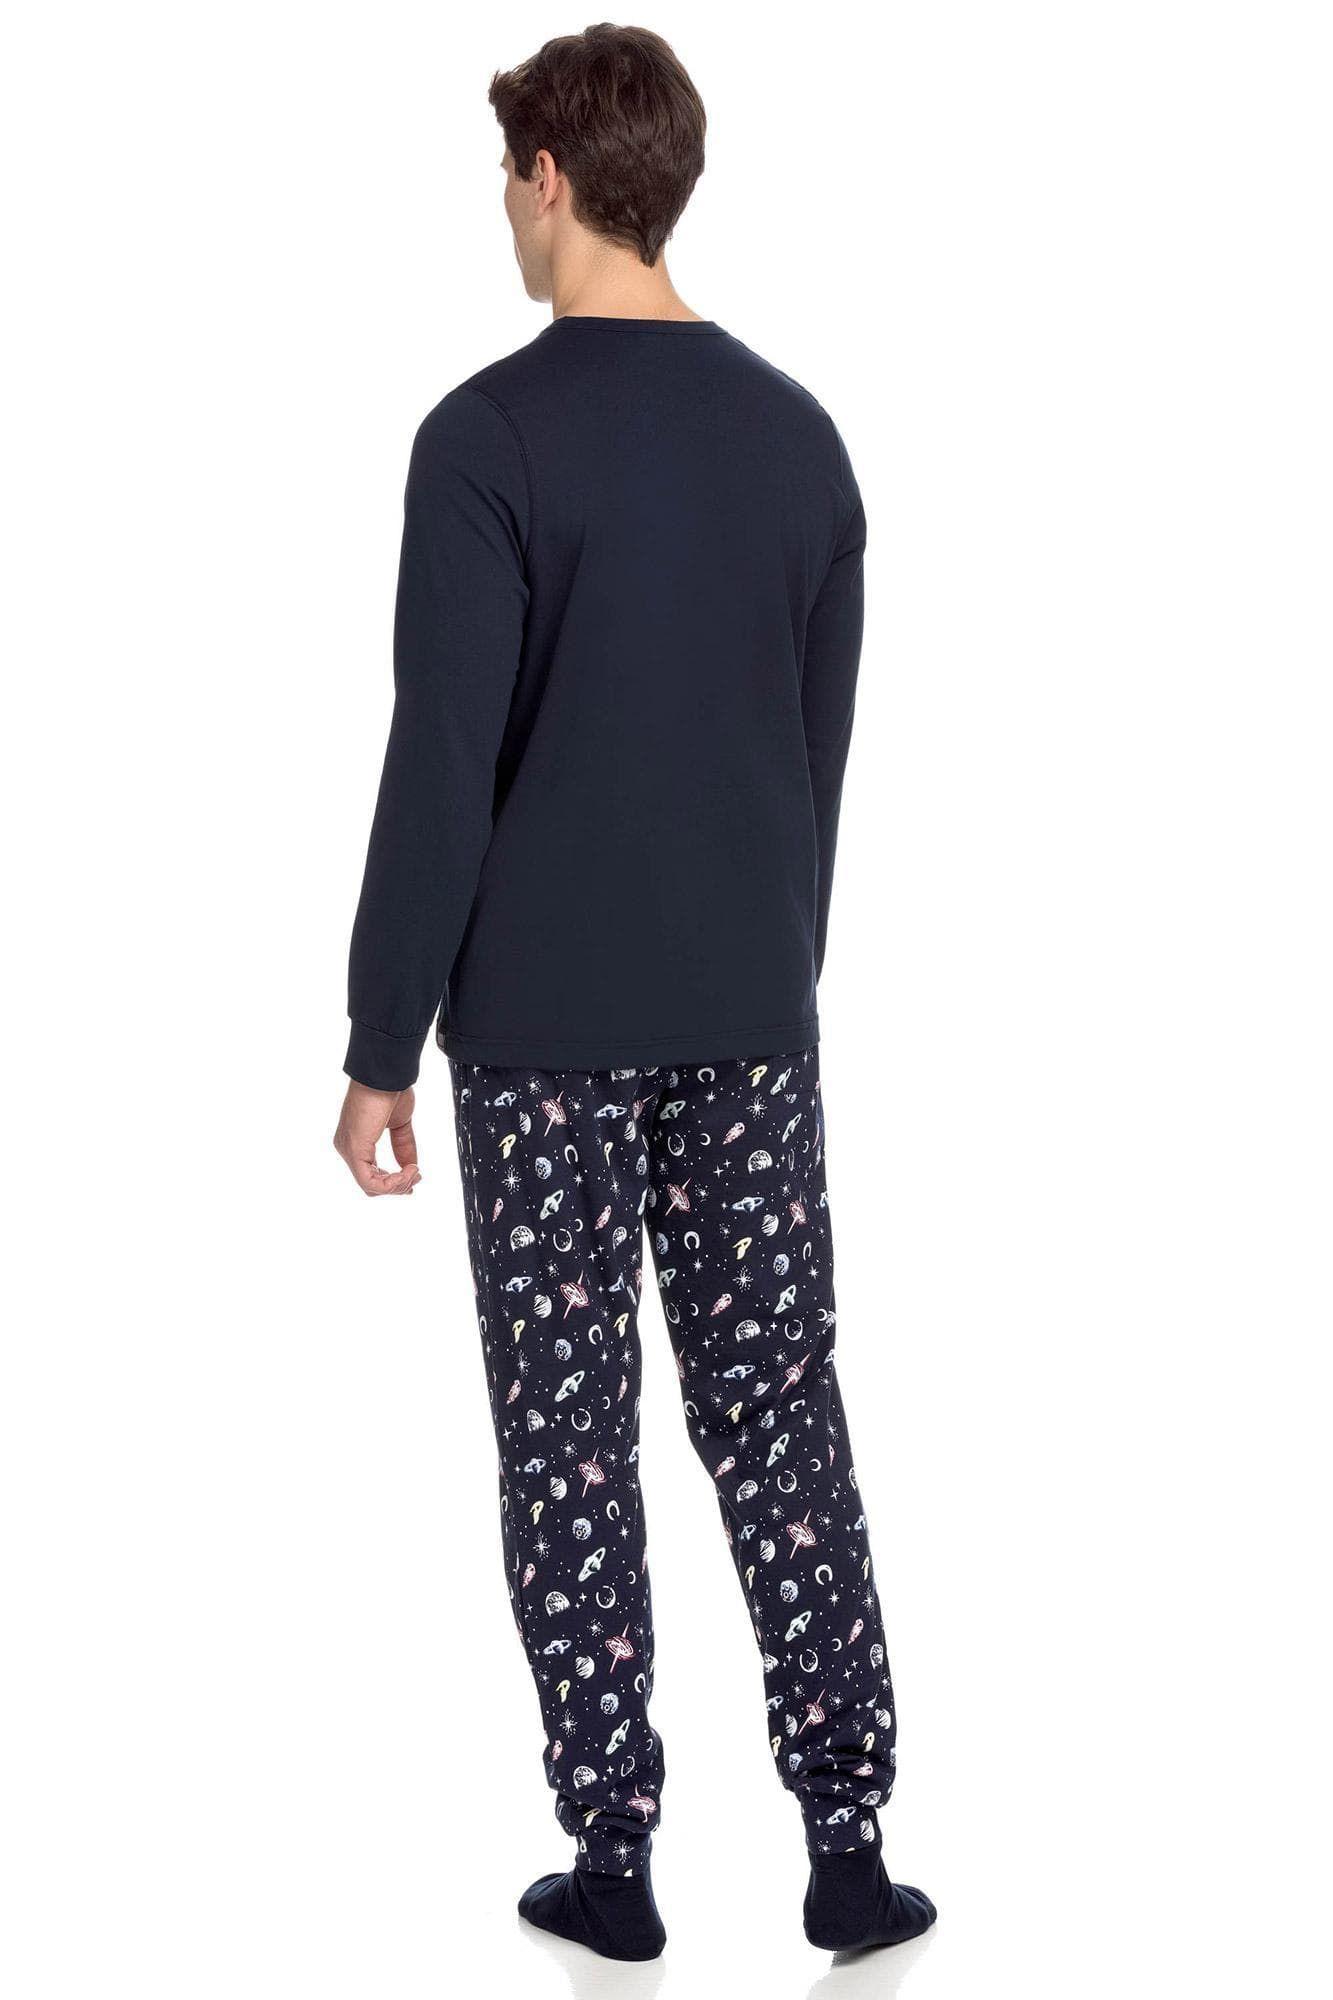 Men's Pyjamas with planets